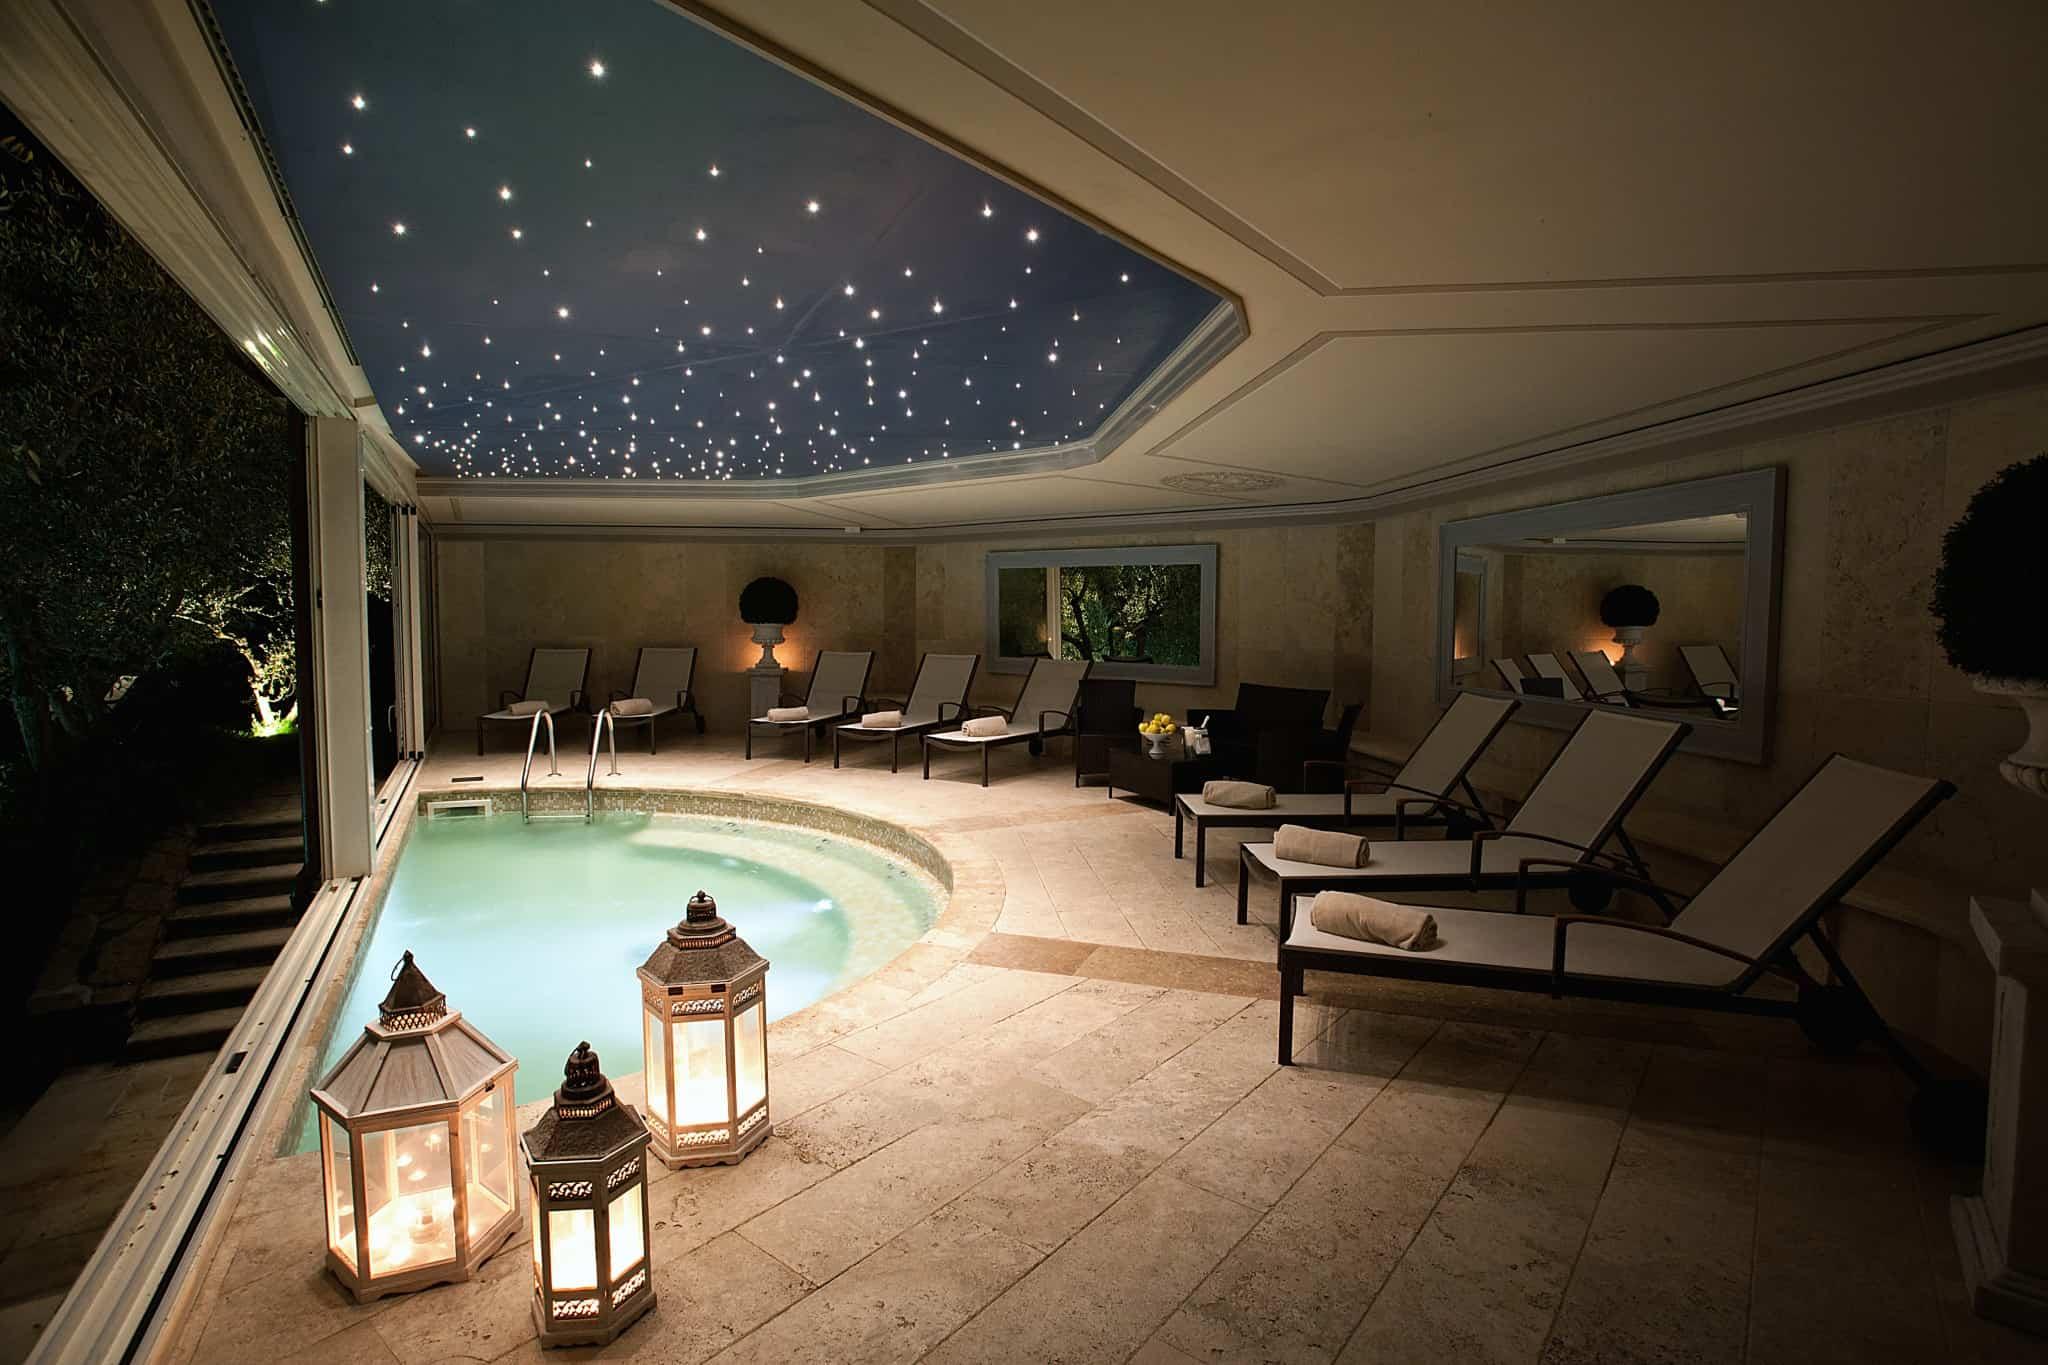 Offerte Vacanze Hotel Toscana